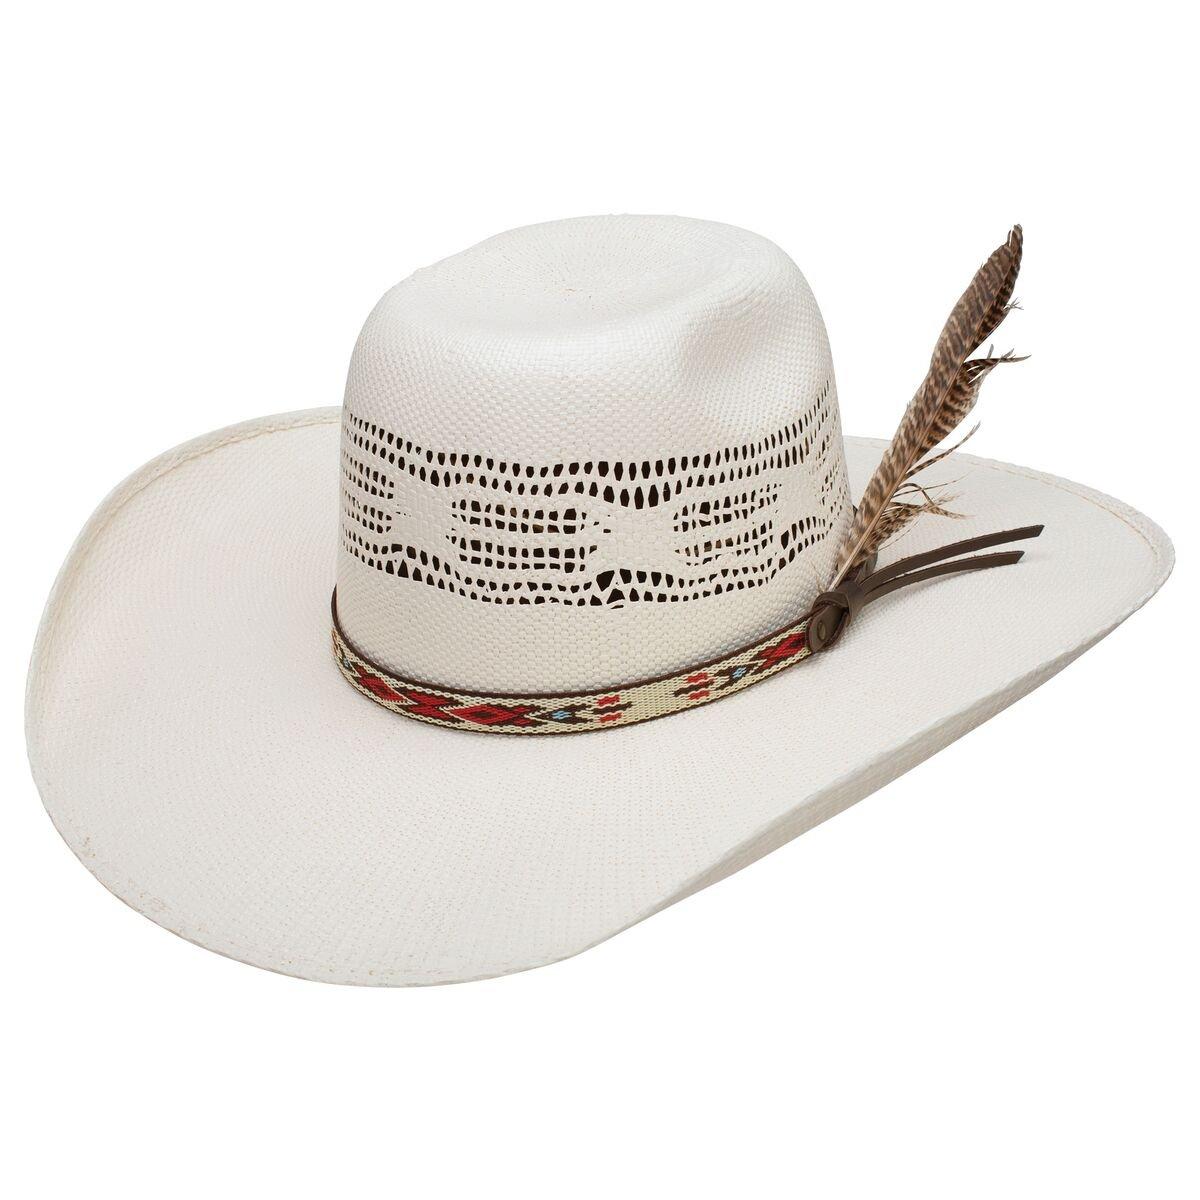 cd4fb6889c2ee1 Amazon.com: Resistol Boys Young Gun Jr 4 Brim Straw Cowboy Hat OS Natural:  Clothing